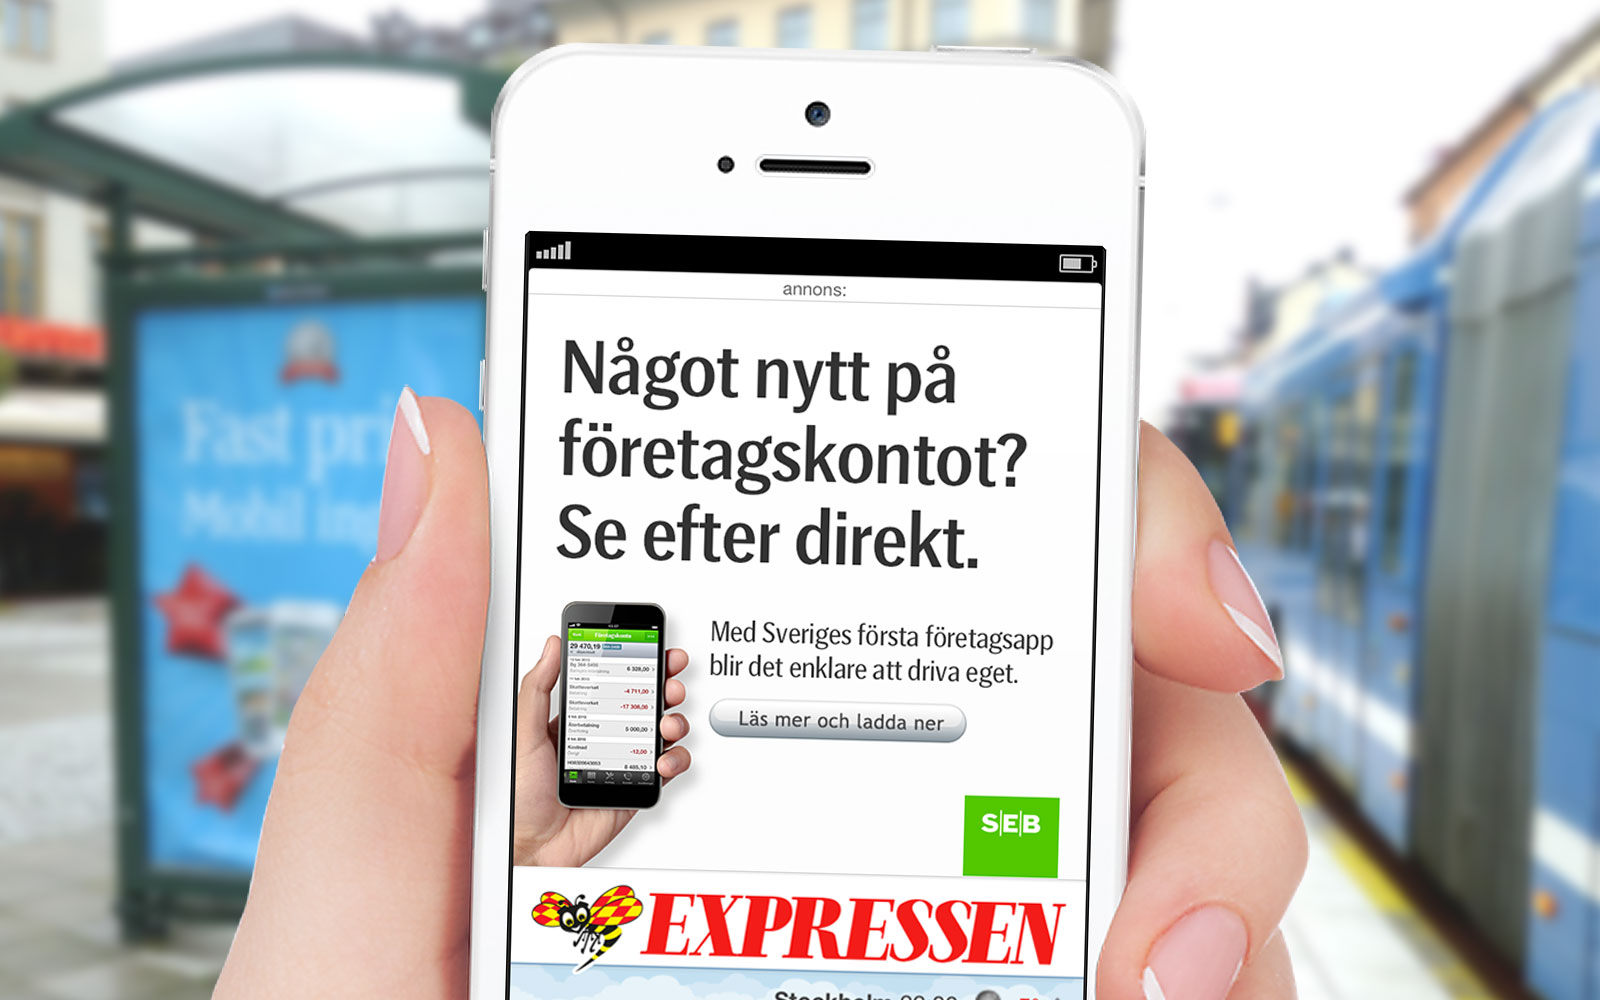 newsforallrunningabusiness_3.jpg